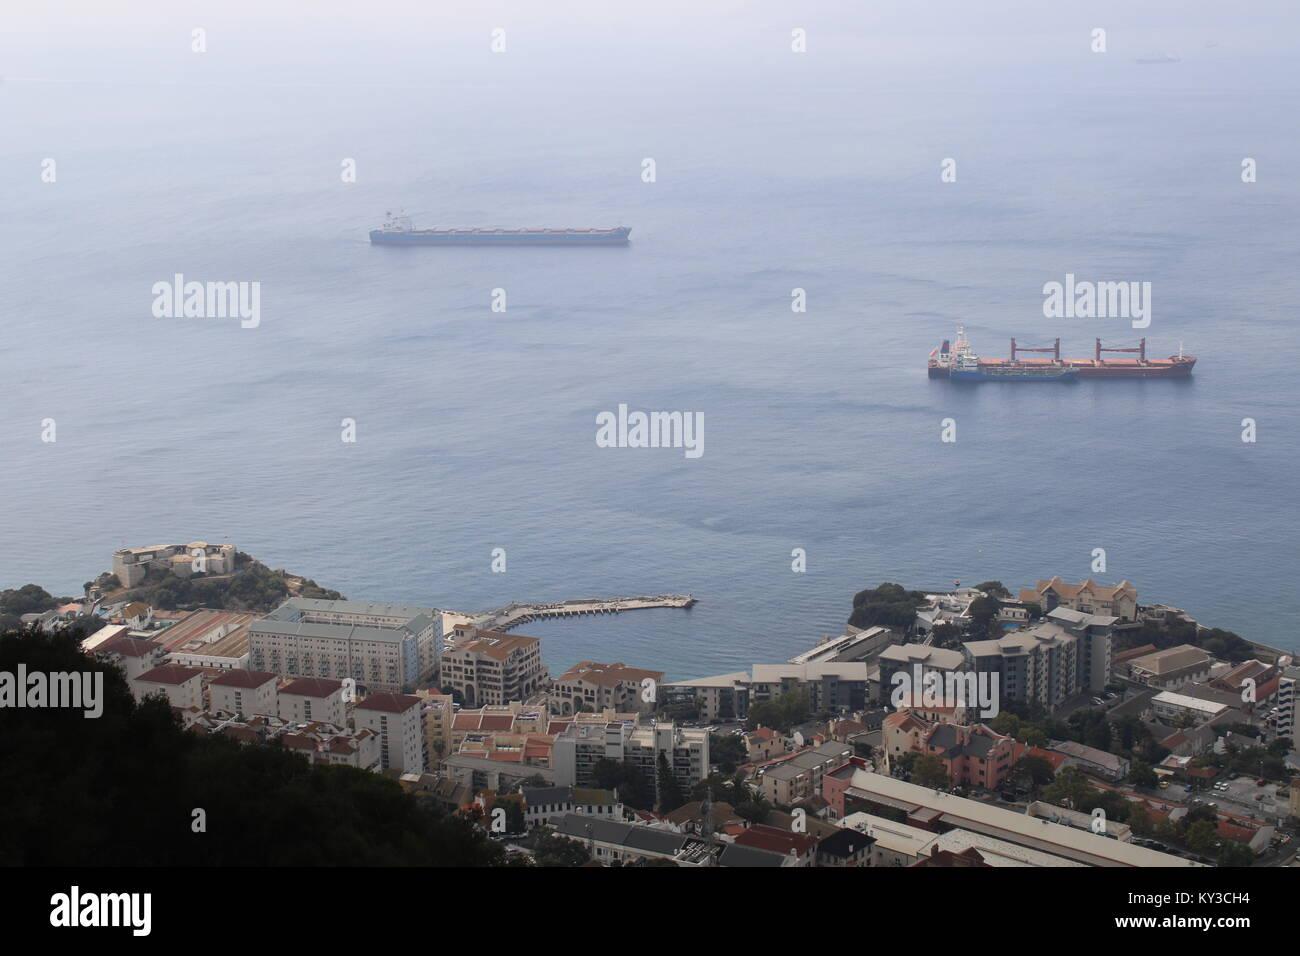 views in gibraltar - Stock Image